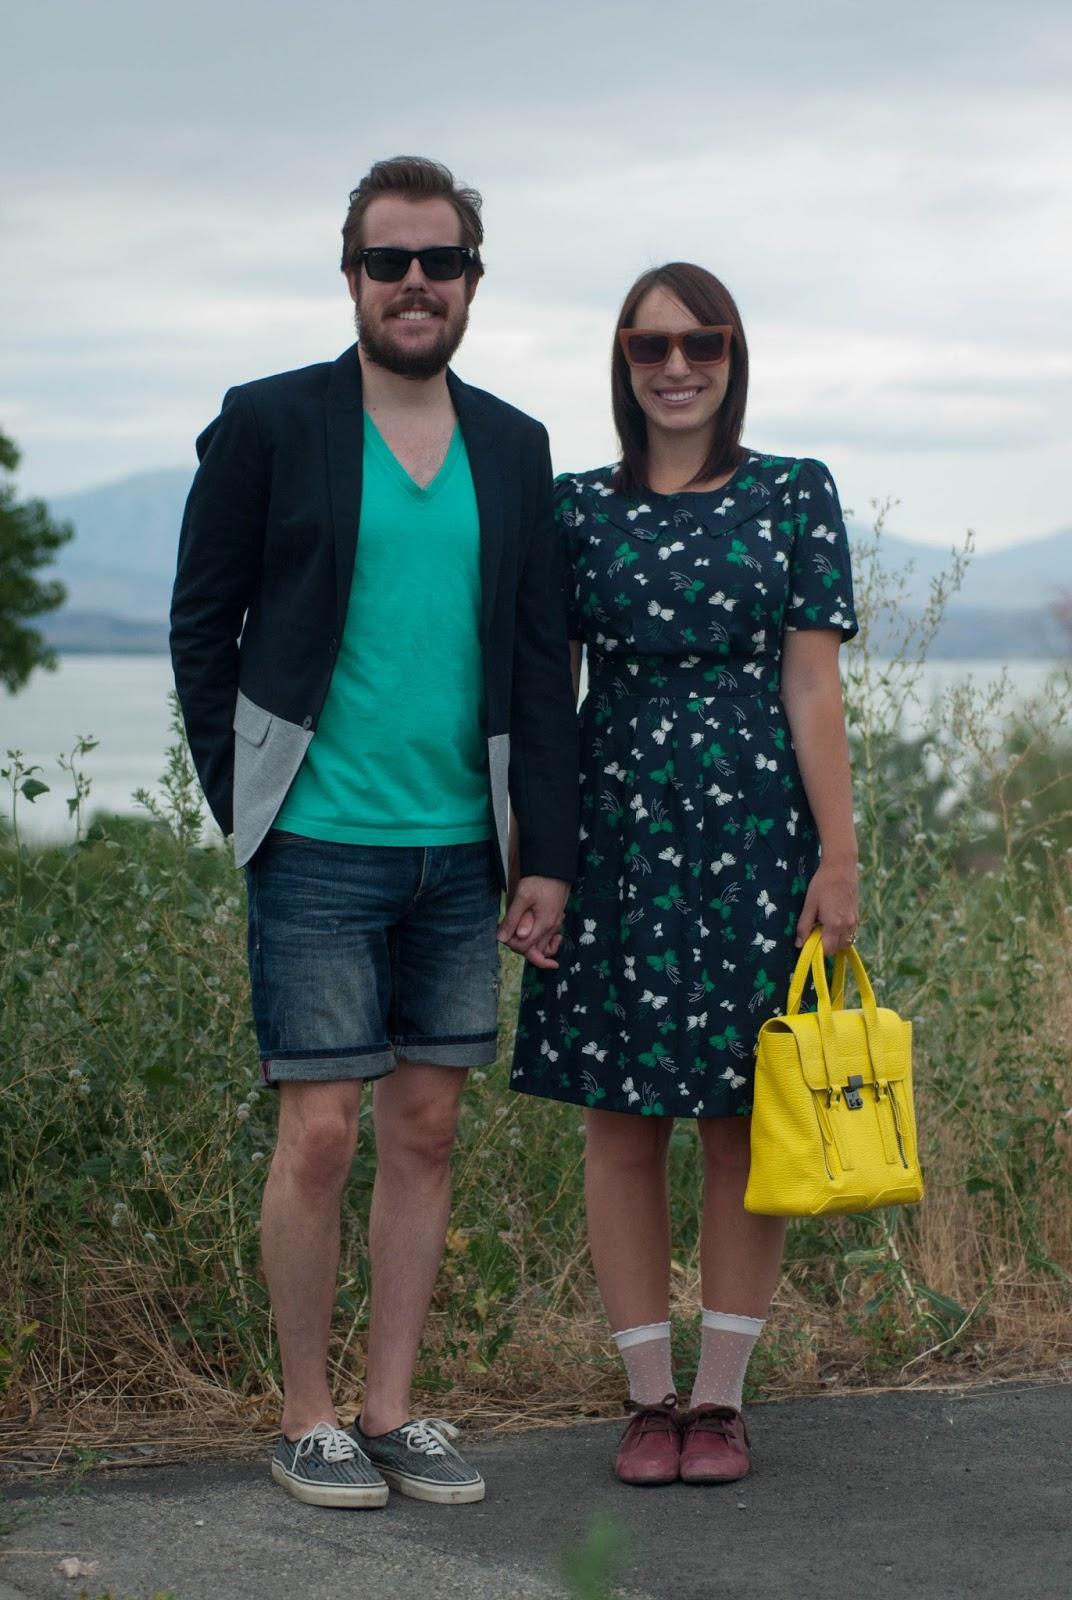 couples fashion, couples style, fashion blog, style blog, ootd, 3.1 phillip lim, zara, anthropologie